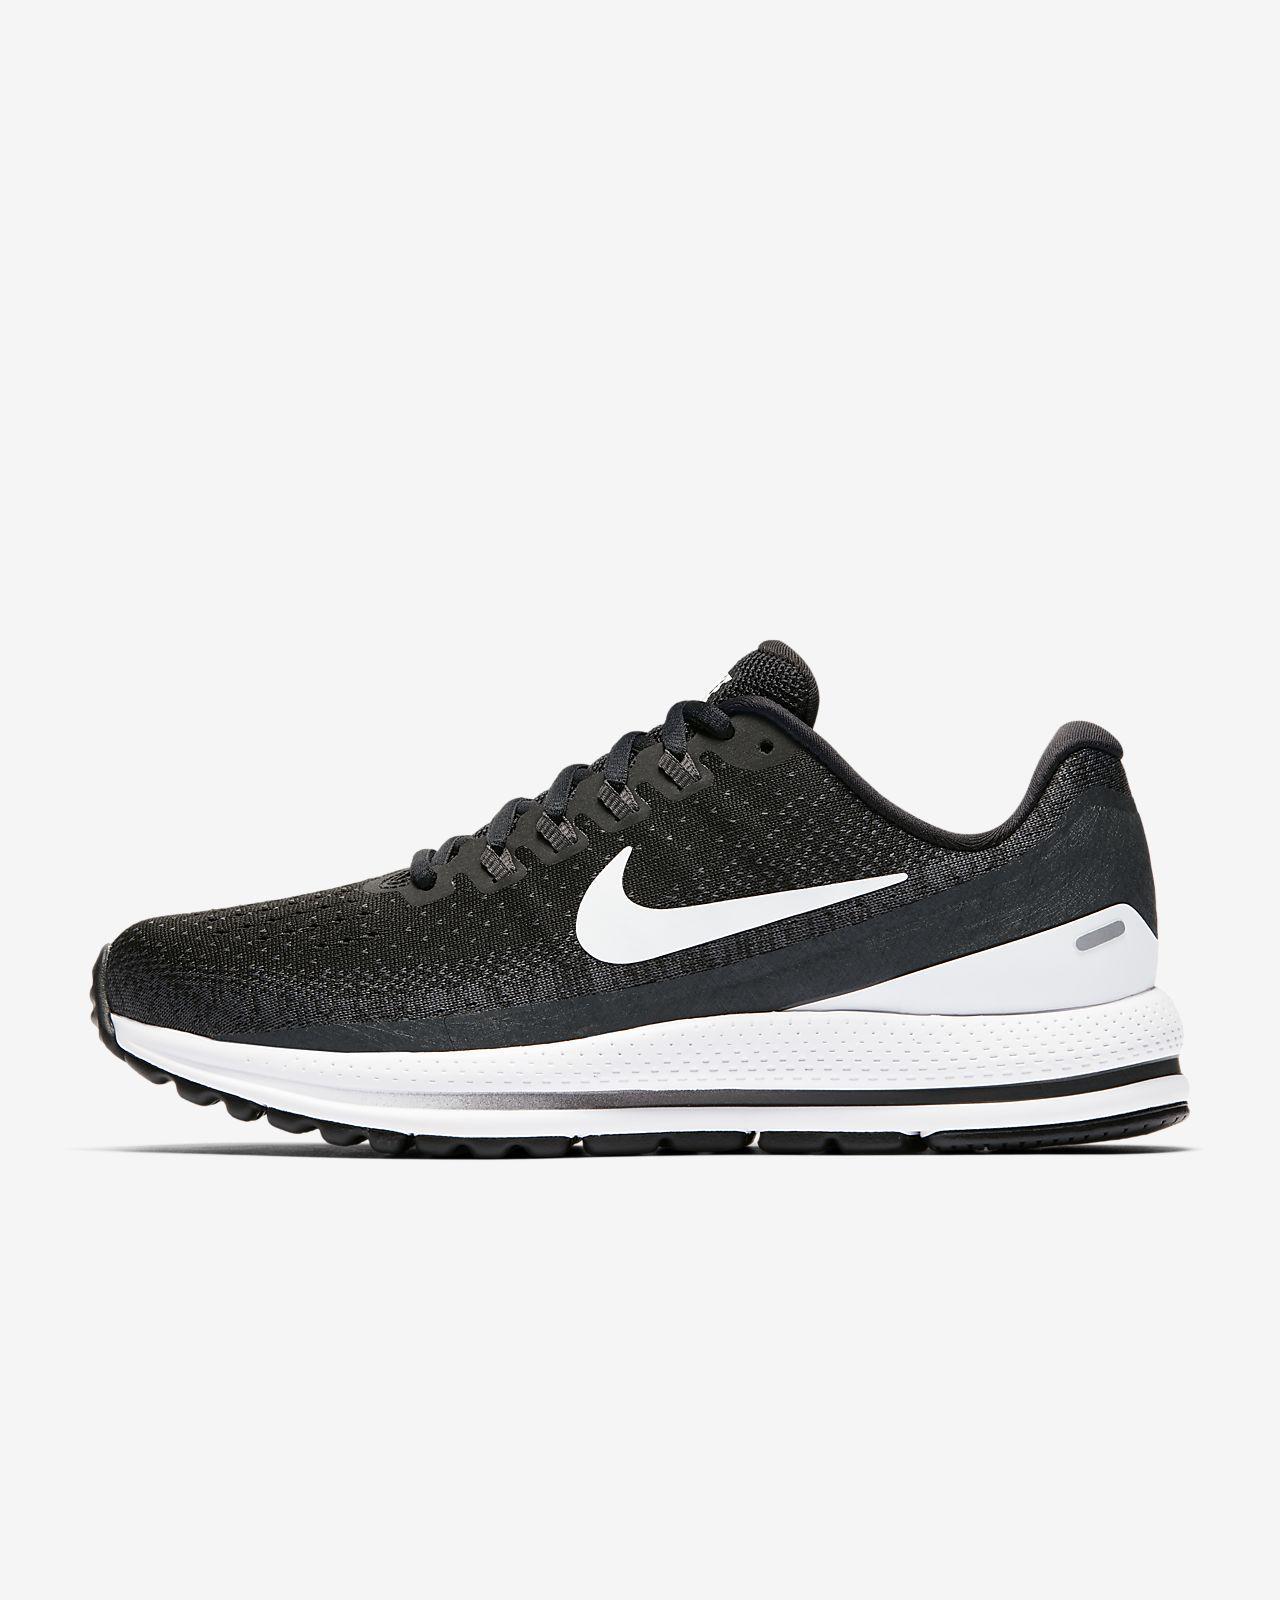 Nike Air Zoom Vomero 13 Damen Laufschuh